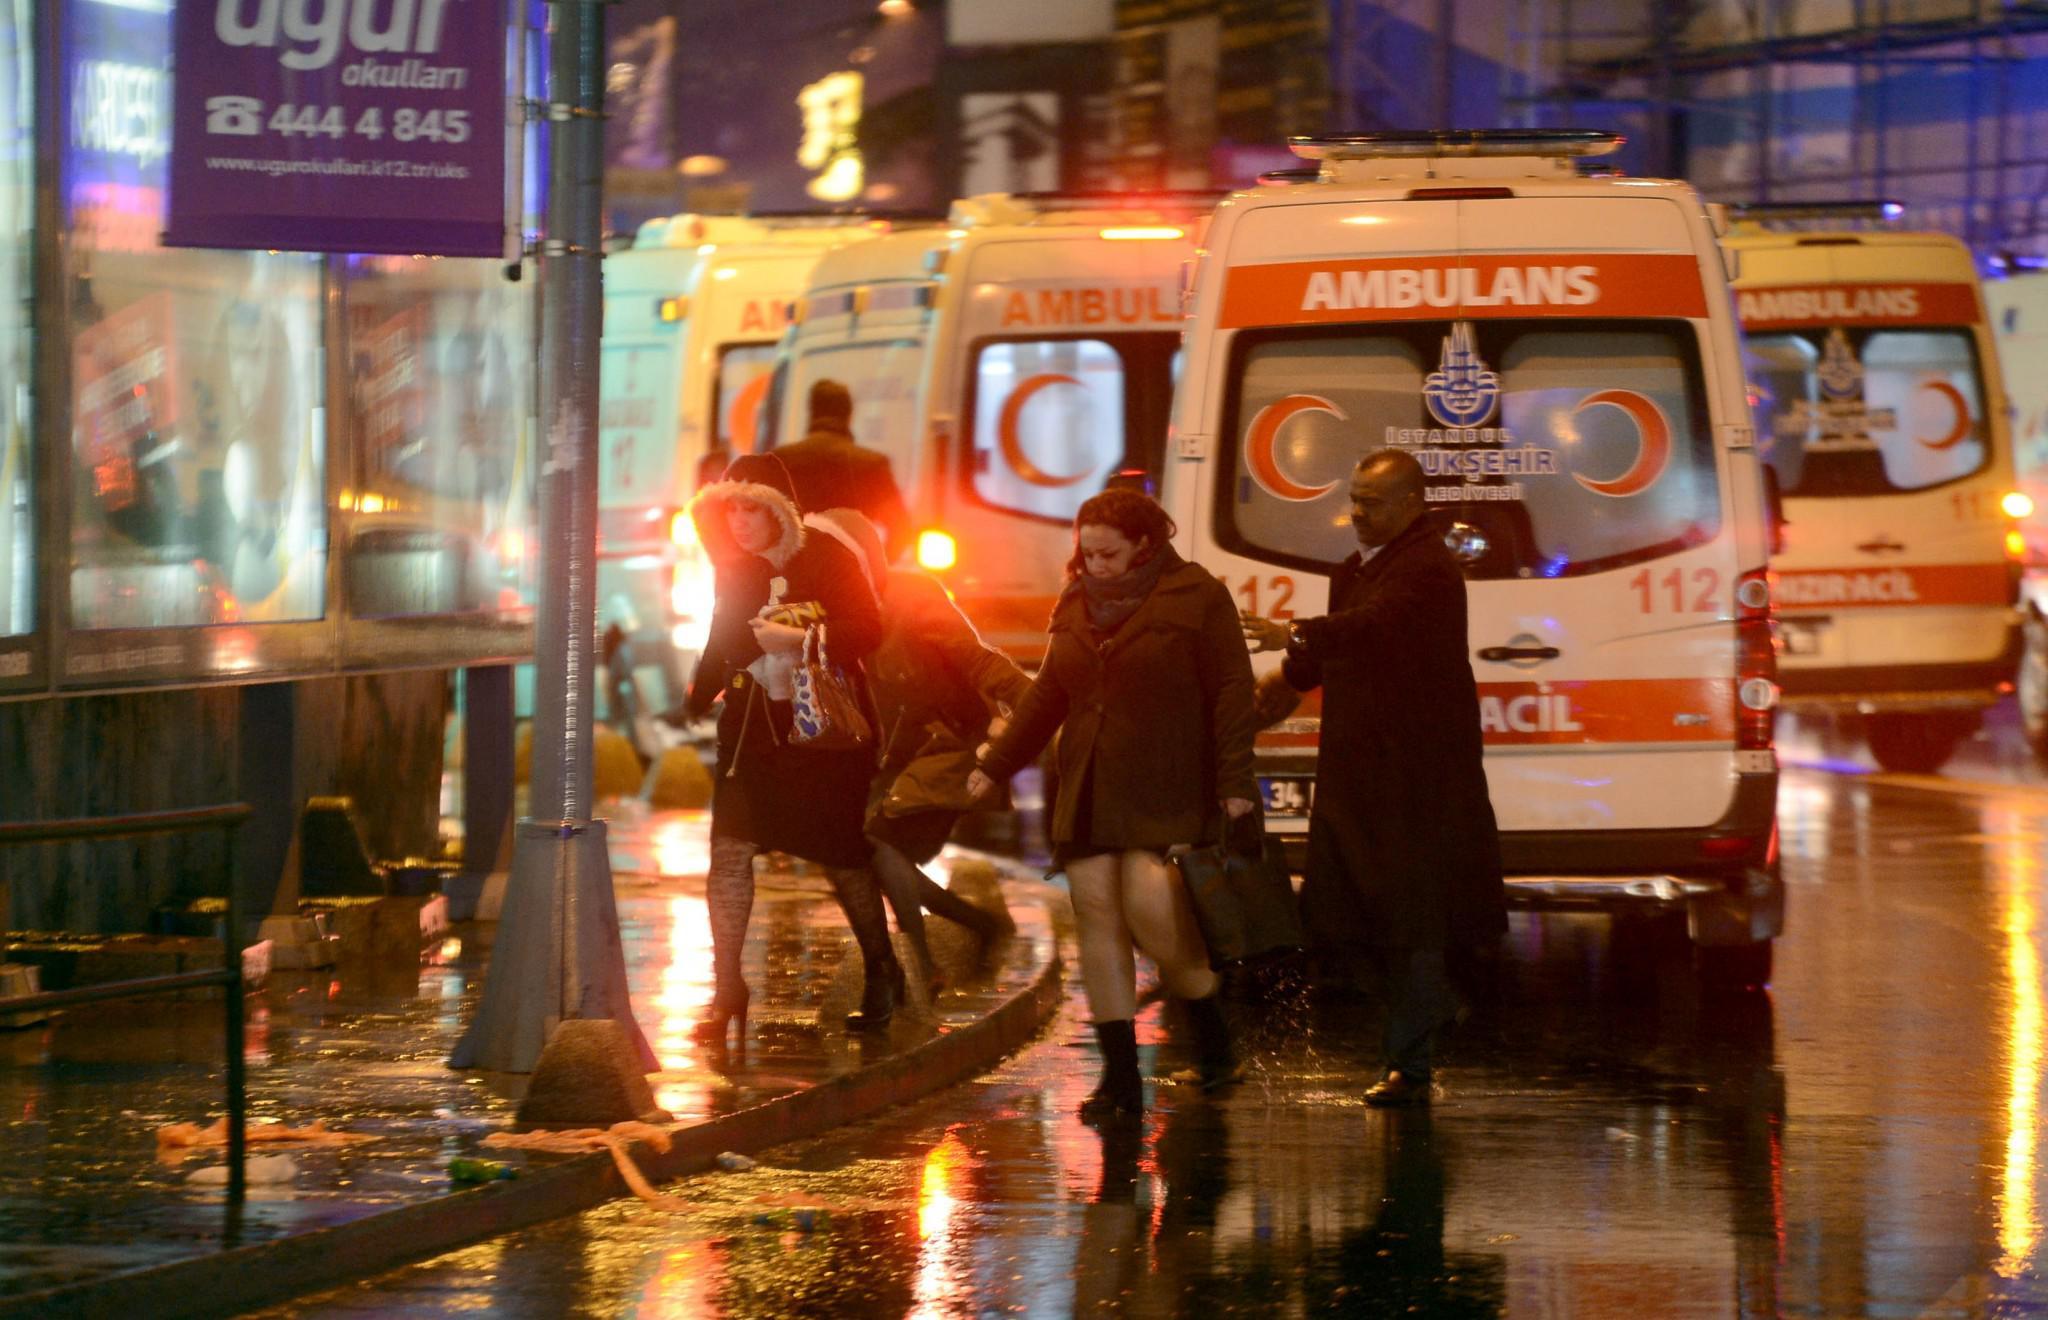 tourkia-epithesi-klamp-nekroi-9 Έτσι σκόρπισε τον θάνατο ο μακελάρης της Κωνσταντινούπολης [εικόνες & βίντεο]